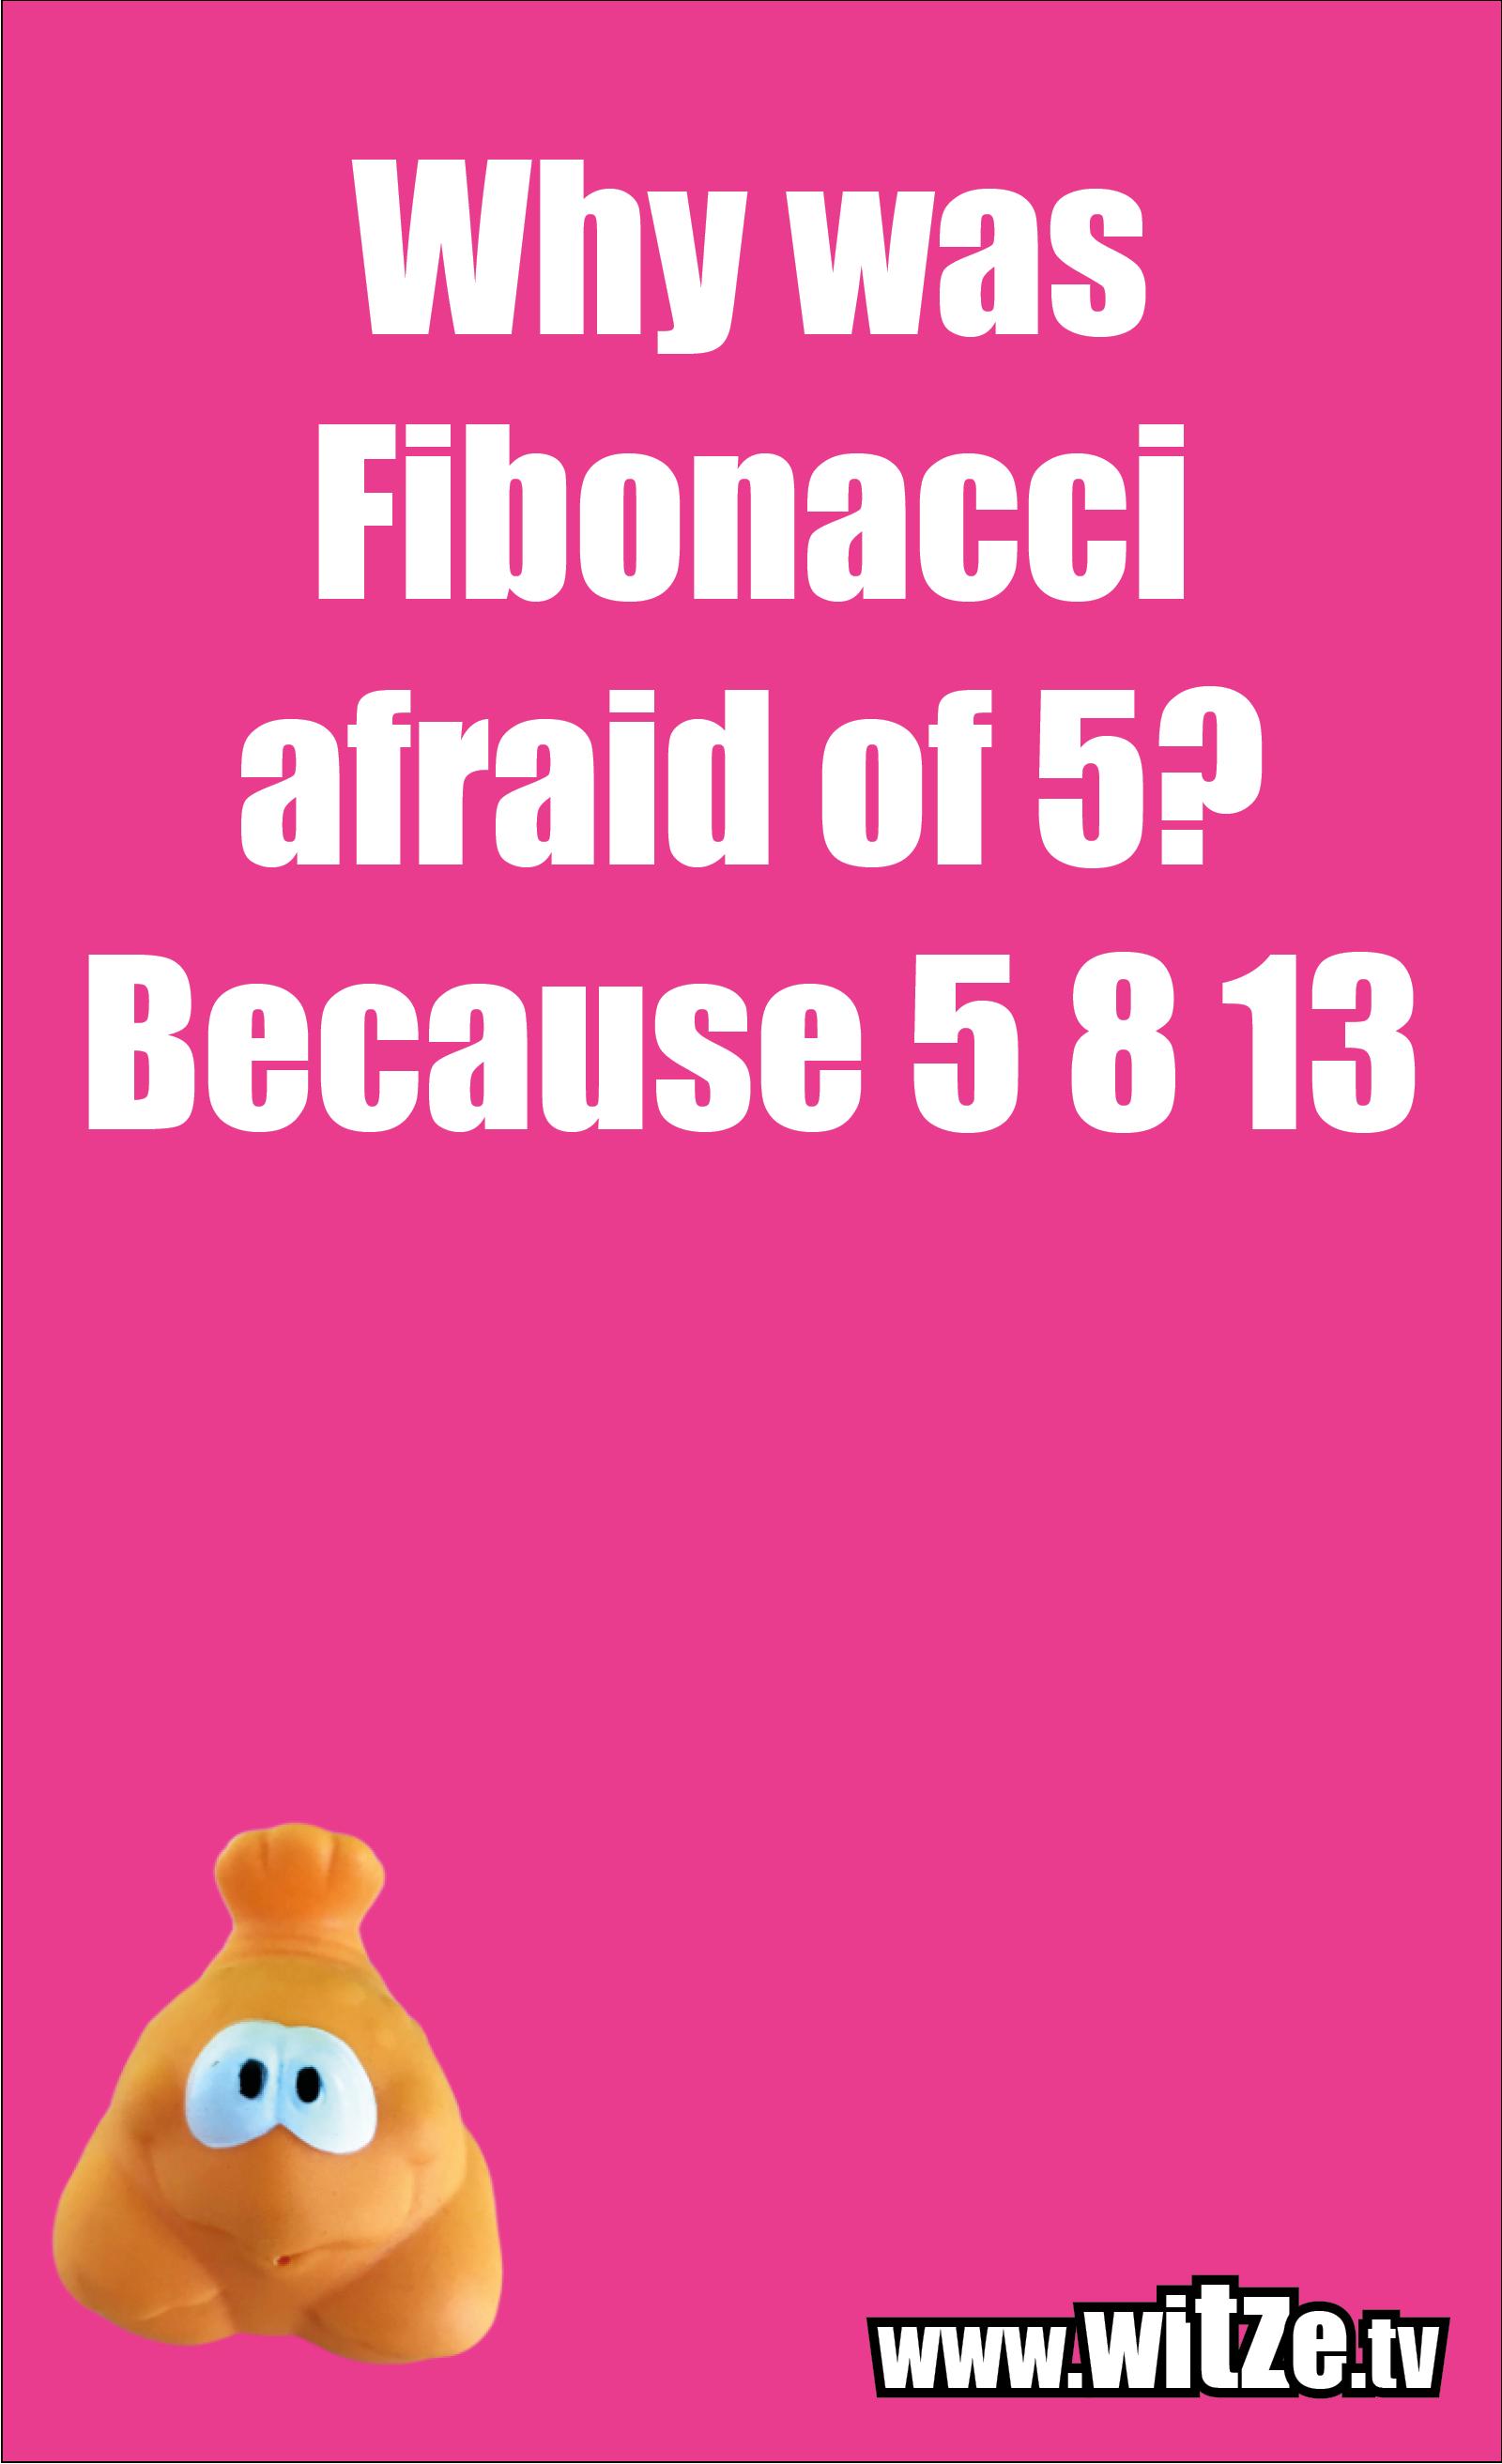 Math joke… Why was Fibonacci afraid of 5? Because 5 8 13